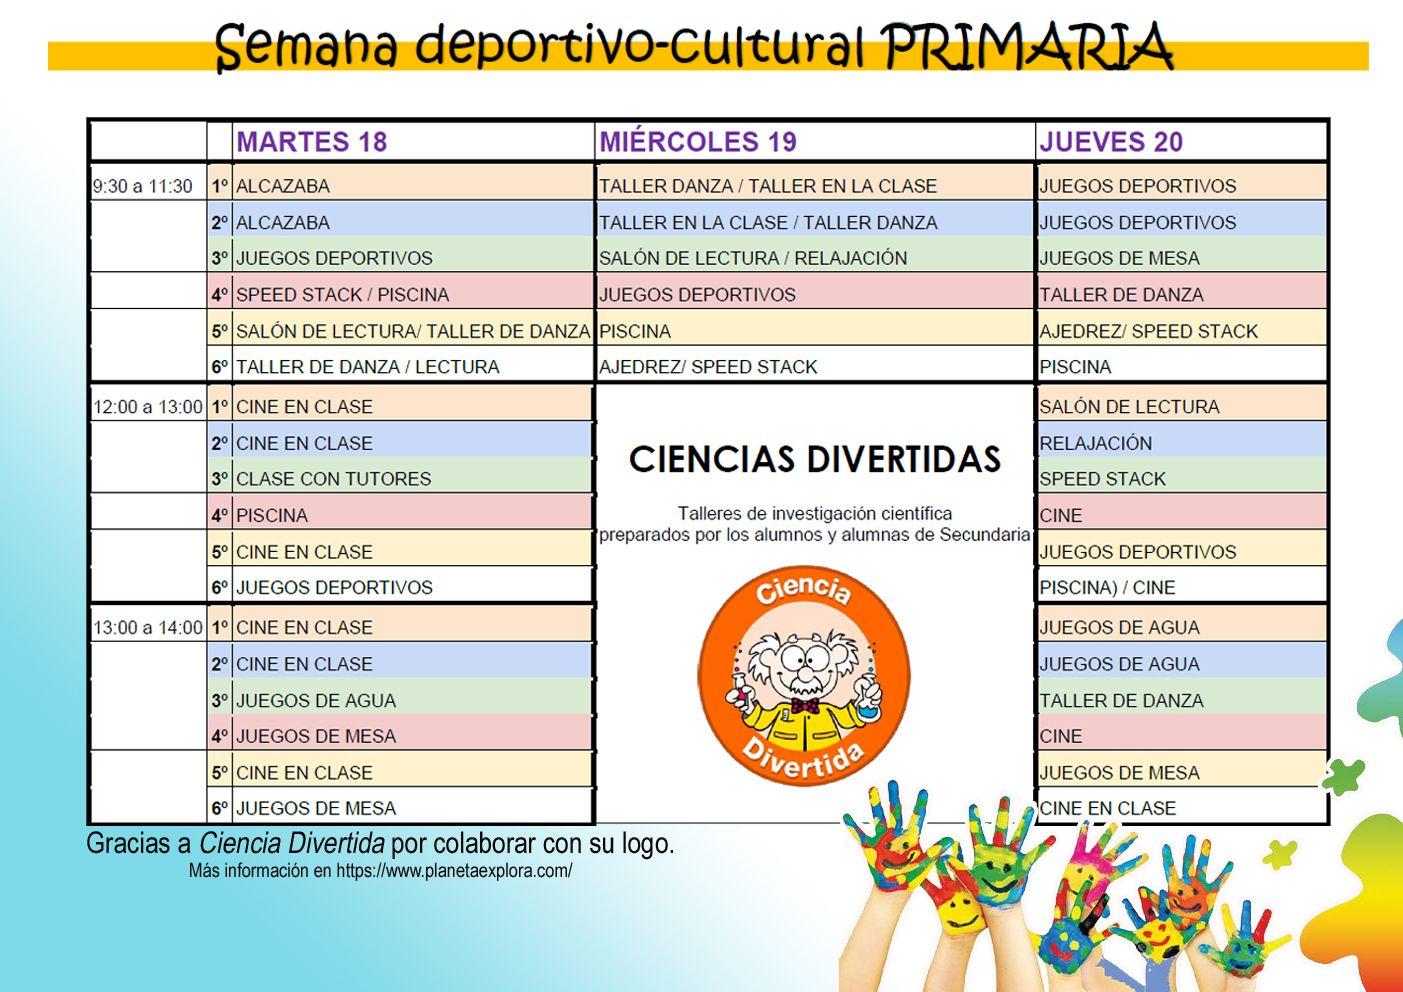 SEMANA DEPORTIVO-CULTURAL PRIMARIA